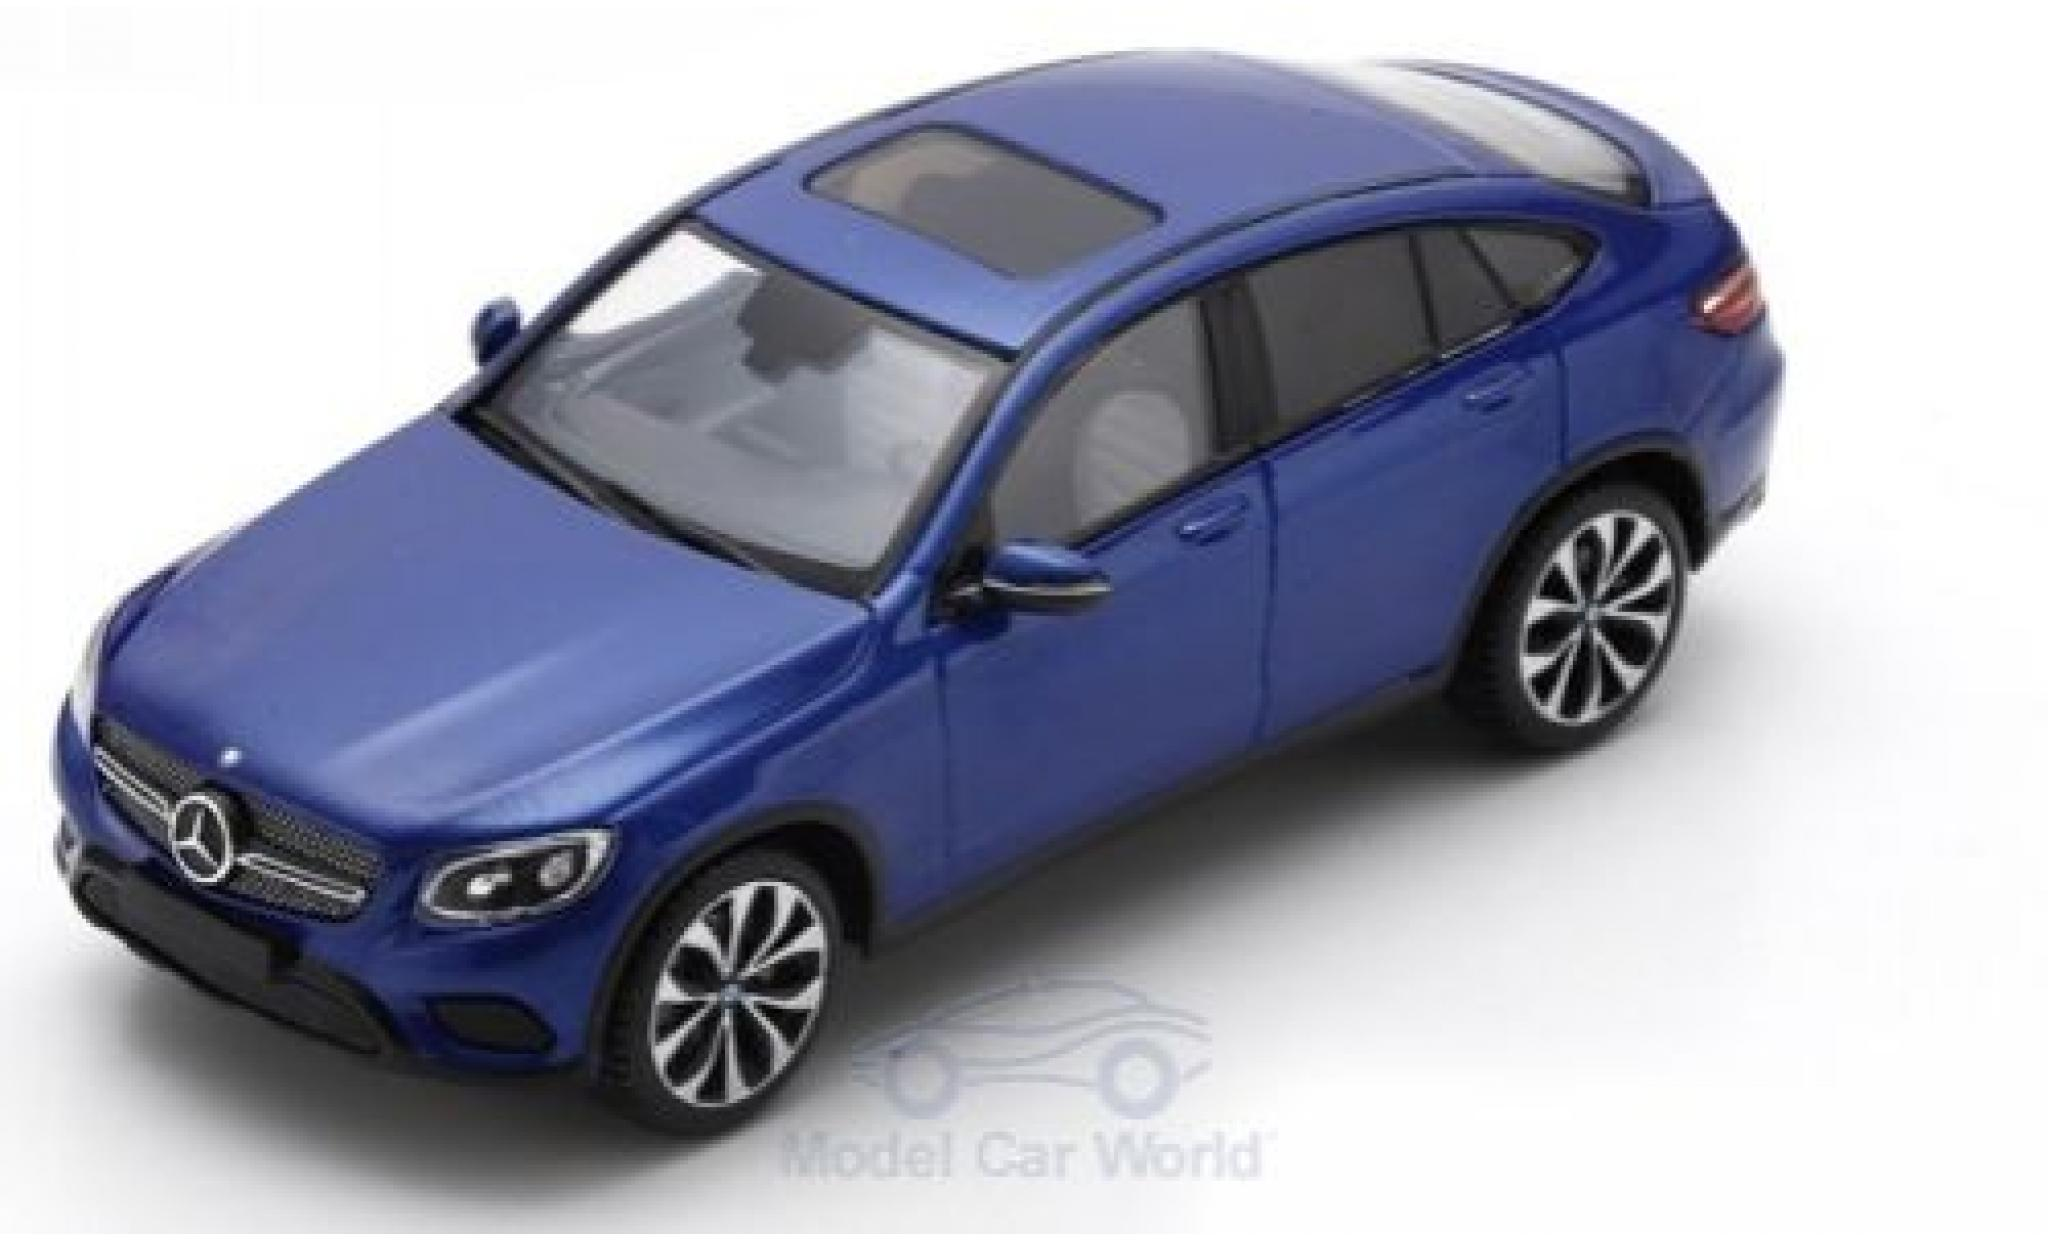 Mercedes Classe GLC 1/43 Spark GLC Coupe metallise bleue 2016